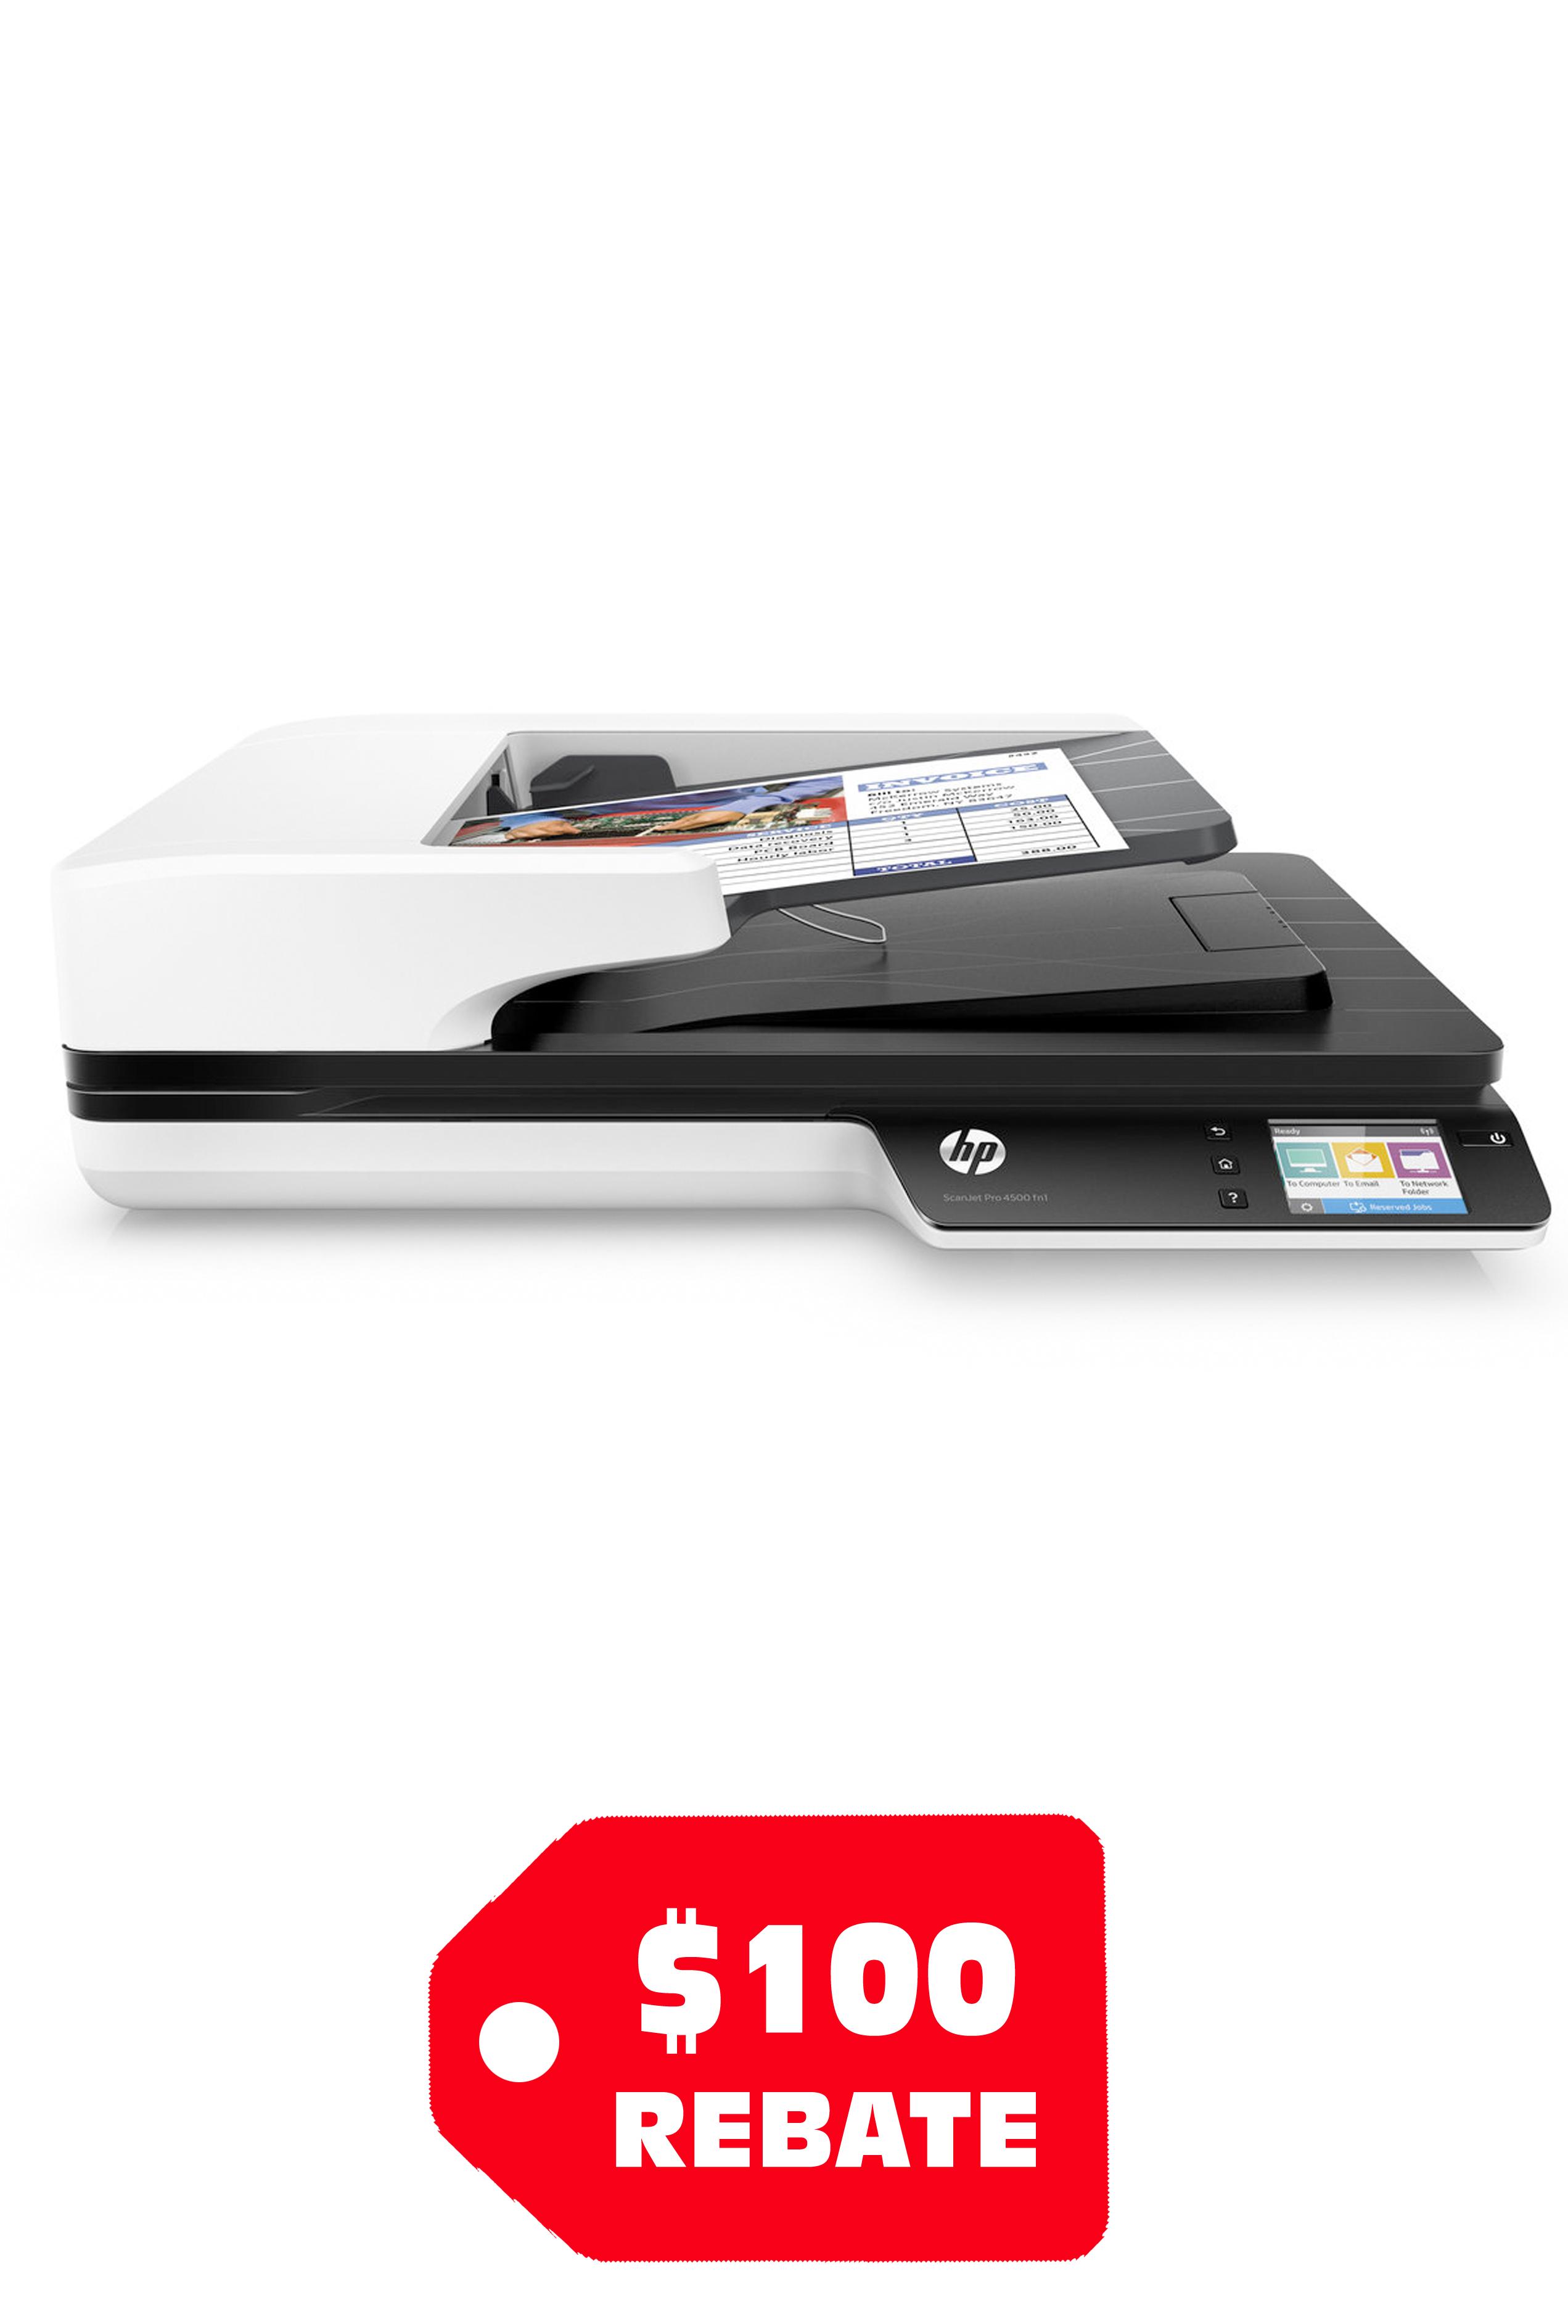 HP ScanJet Pro 4500 fn1 Network...